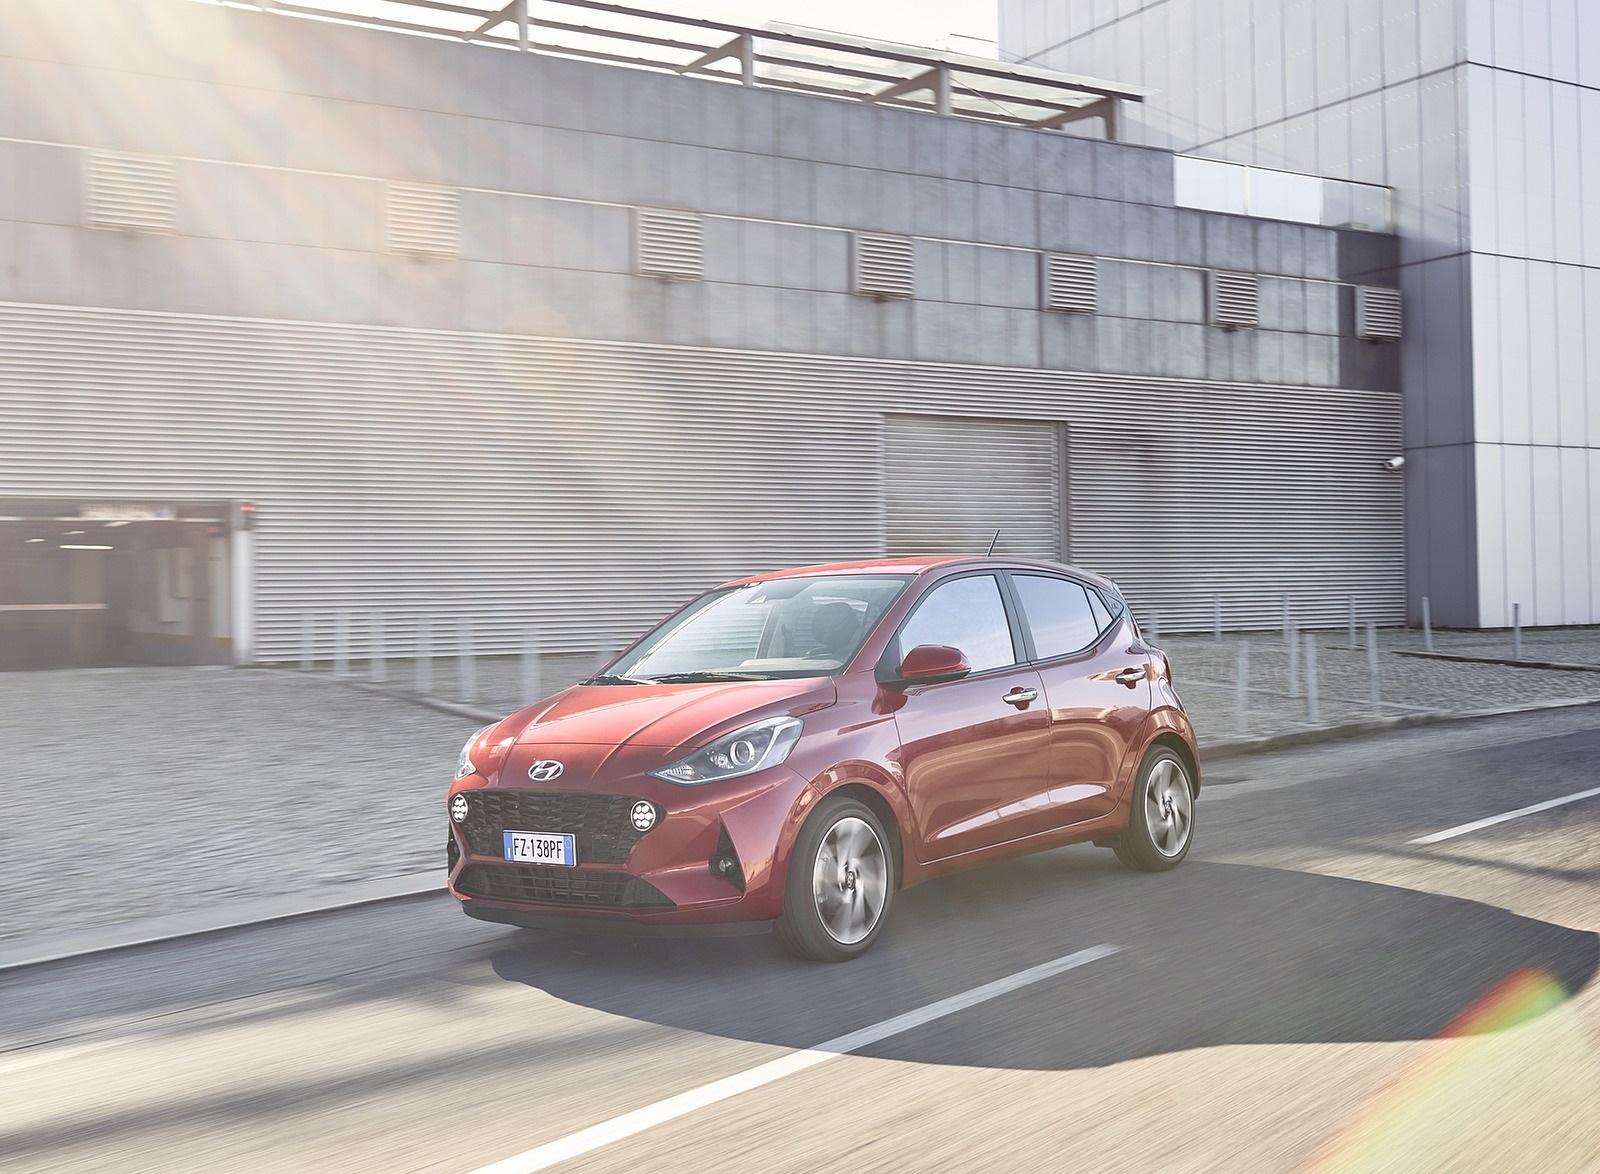 2020 Hyundai i10 Front Three-Quarter Wallpapers #15 of 80